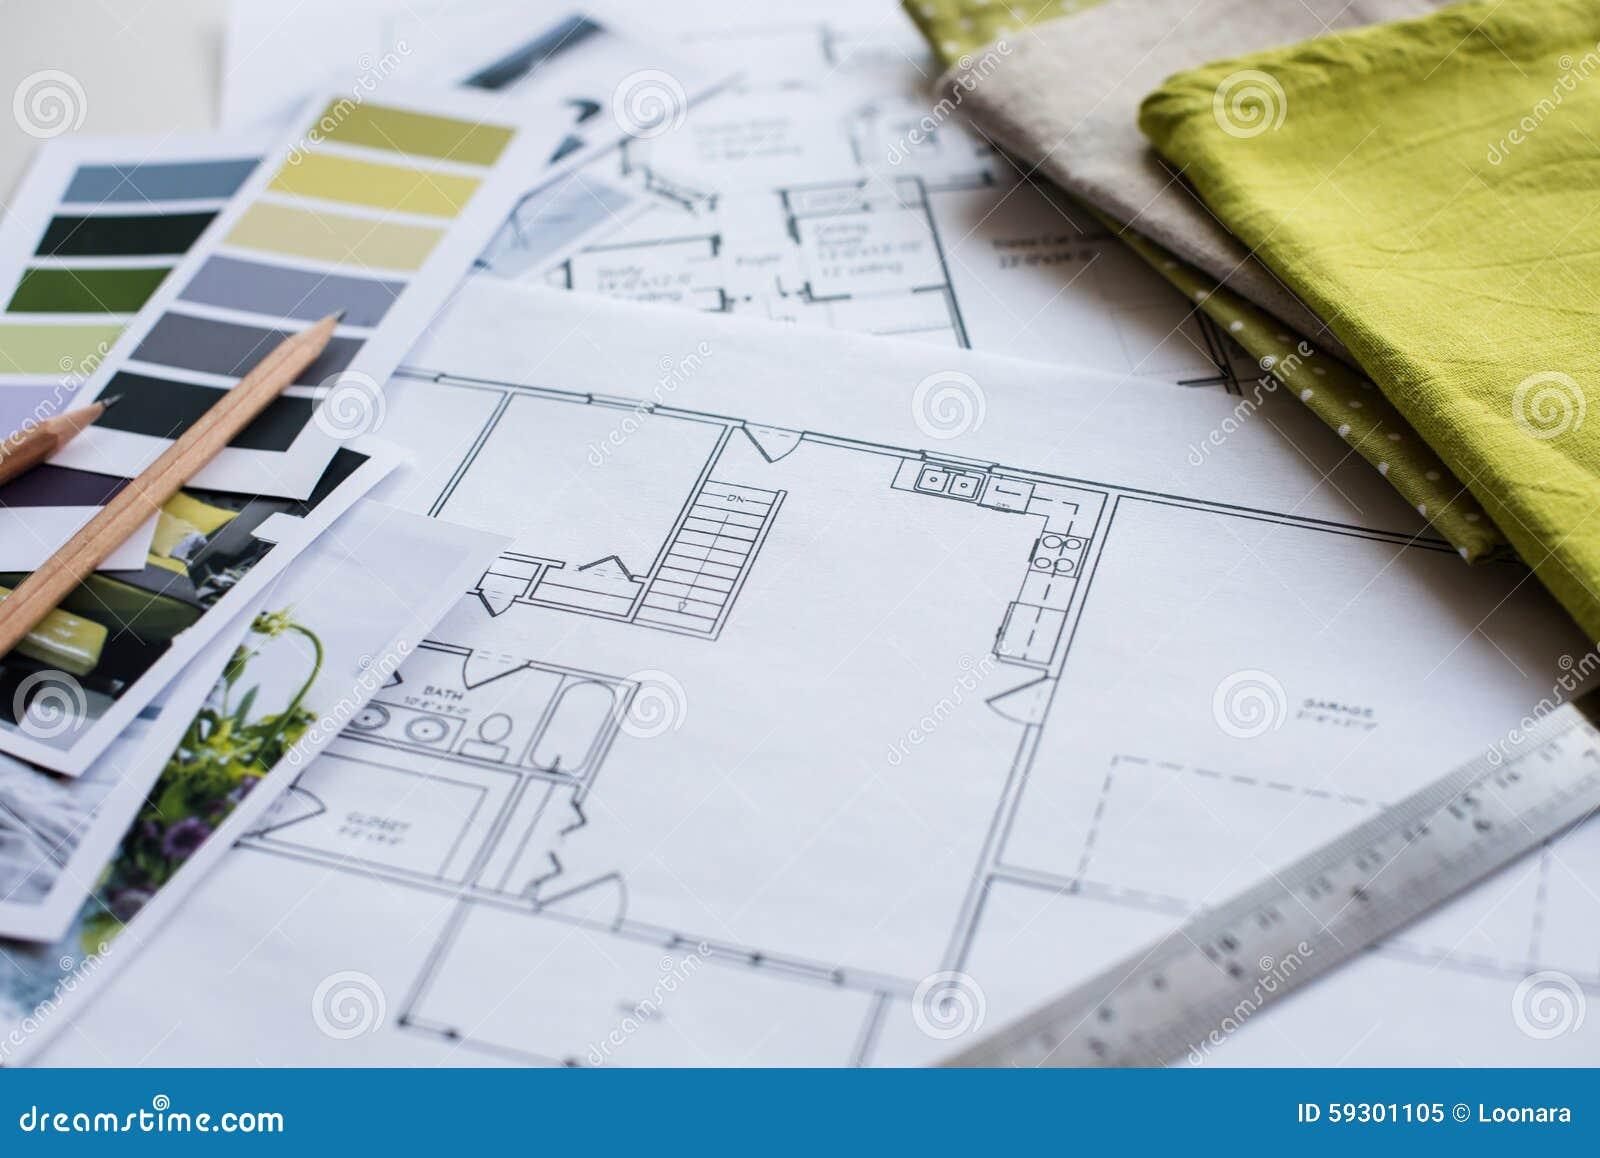 Room Planner Program Interior Designers Working Table Stock Photo Image 59301105